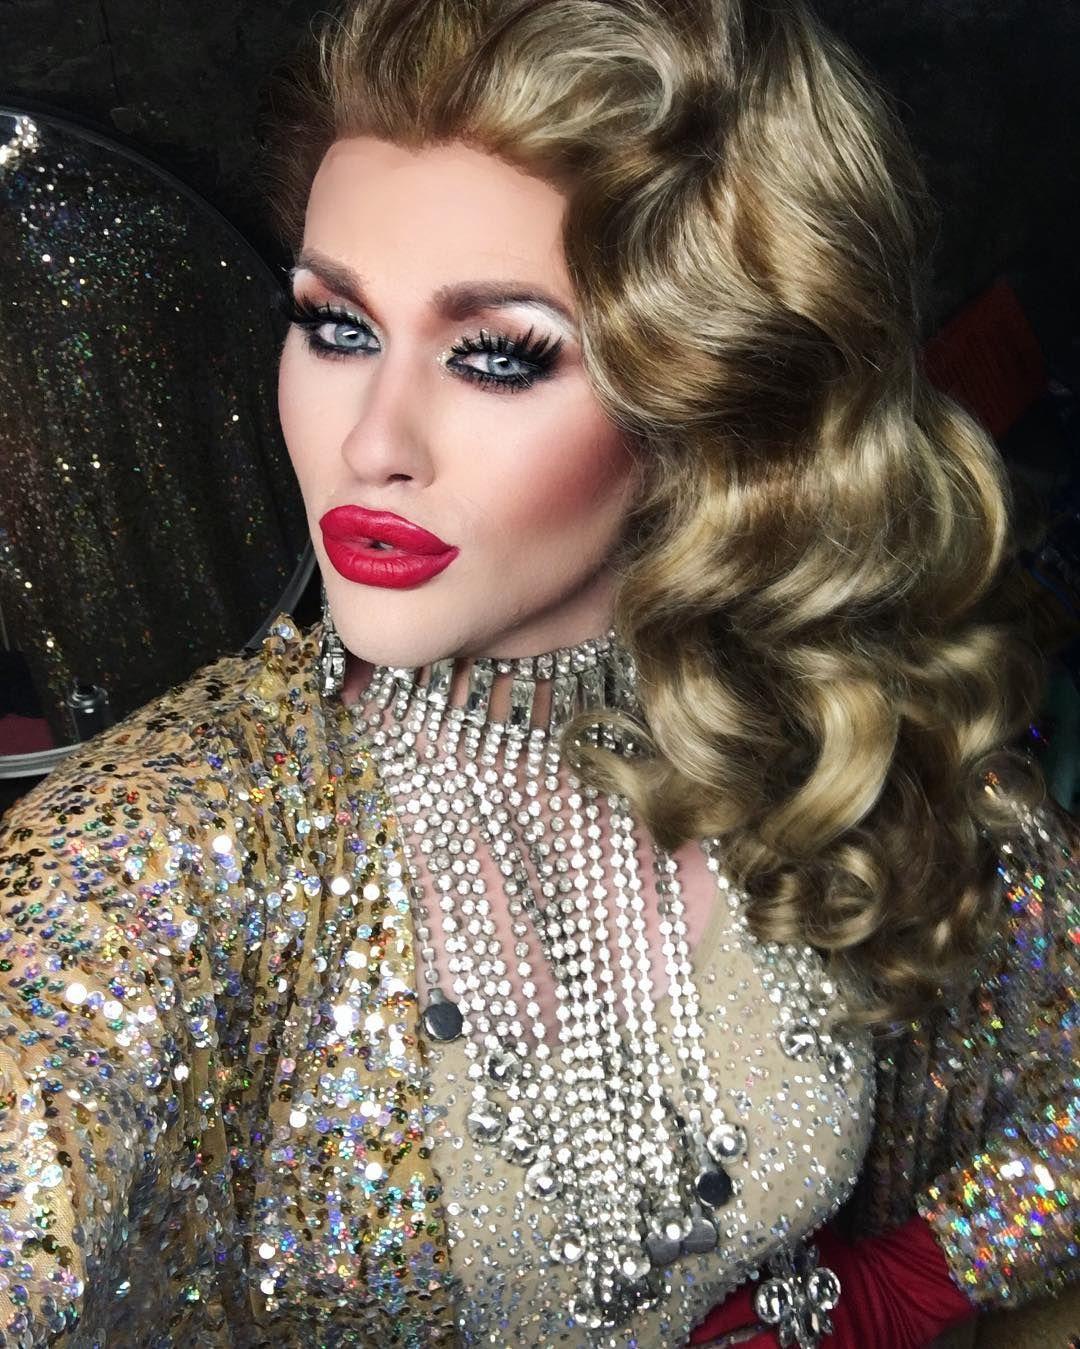 Drag Queen Diva | Girls Wearing Heavy Makeup So Sexy And Slutty | Pinterest | Diva Queens And ...